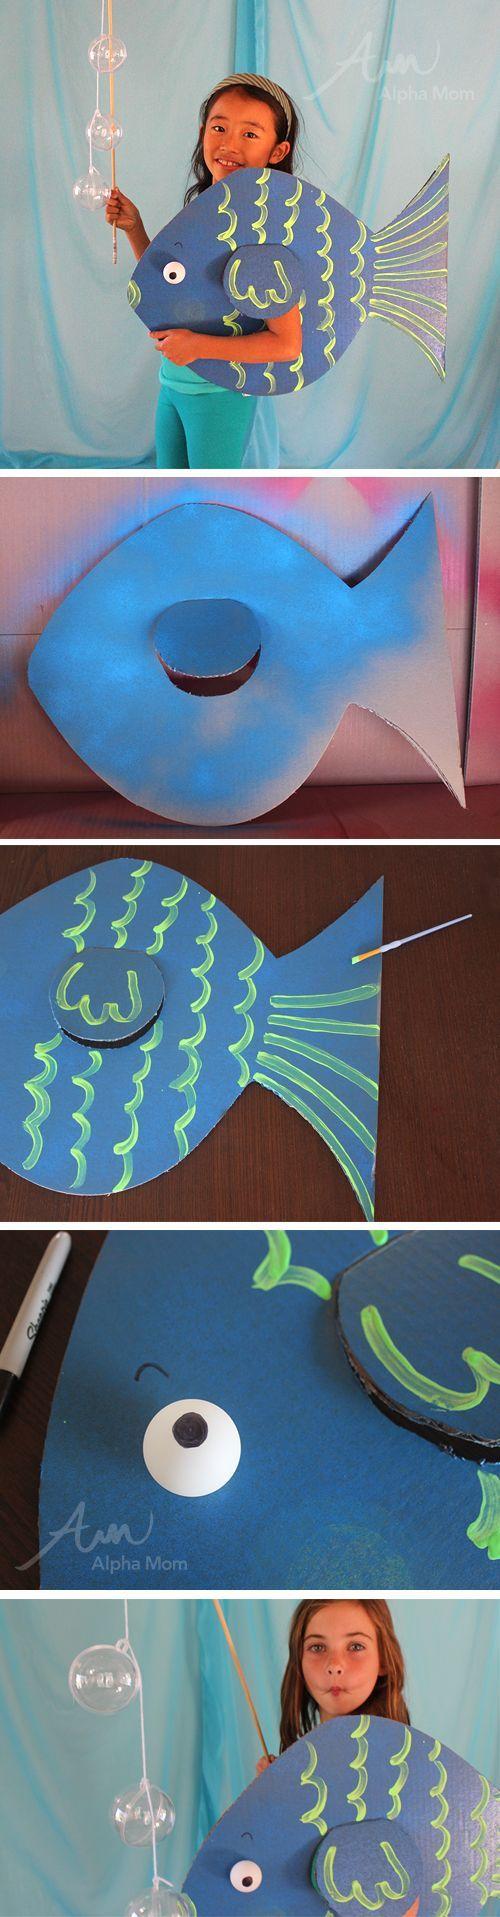 DIY Under the Sea Costumes: Fish! by Brenda Ponnay for Alphamom.com